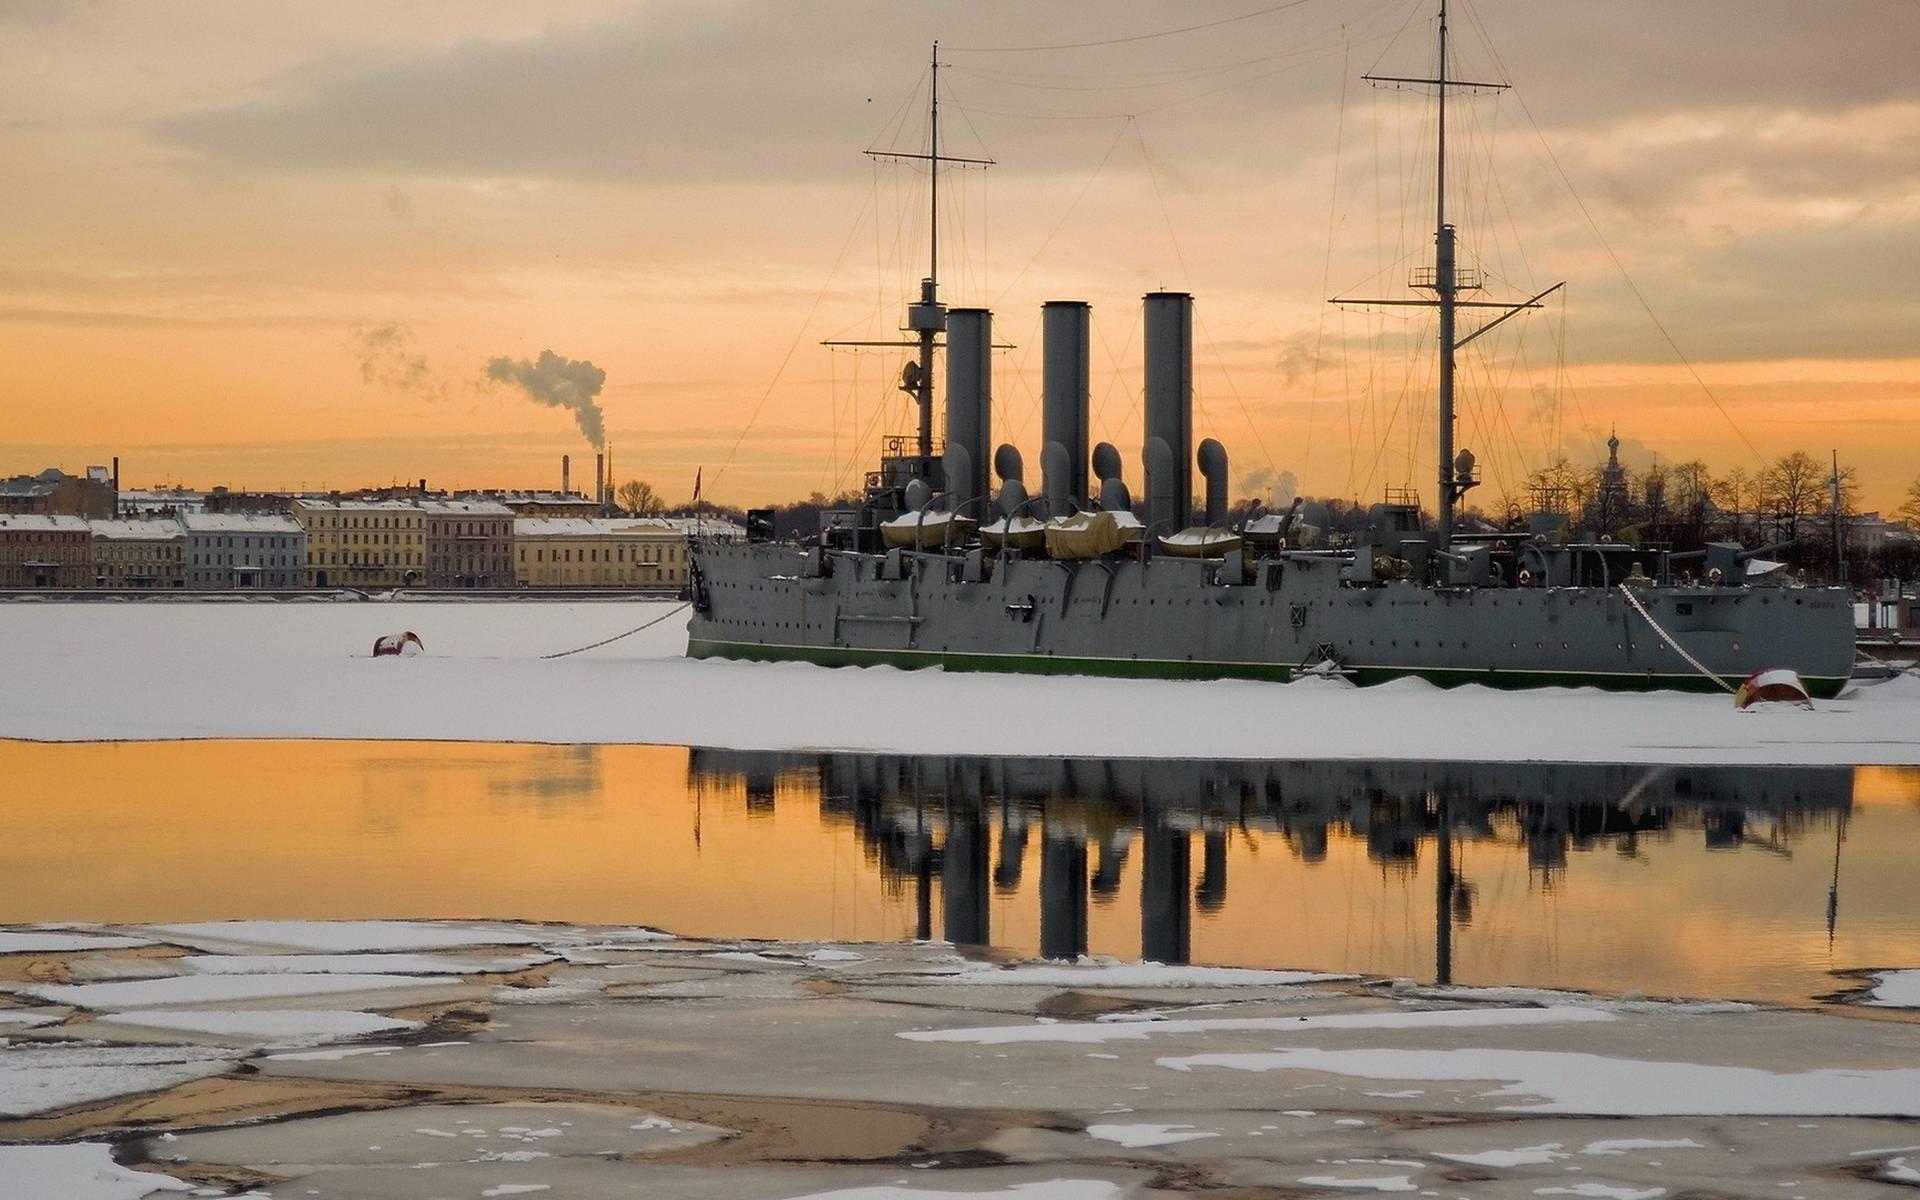 обои Аврора, крейсер, палуба, трубы картинки фото